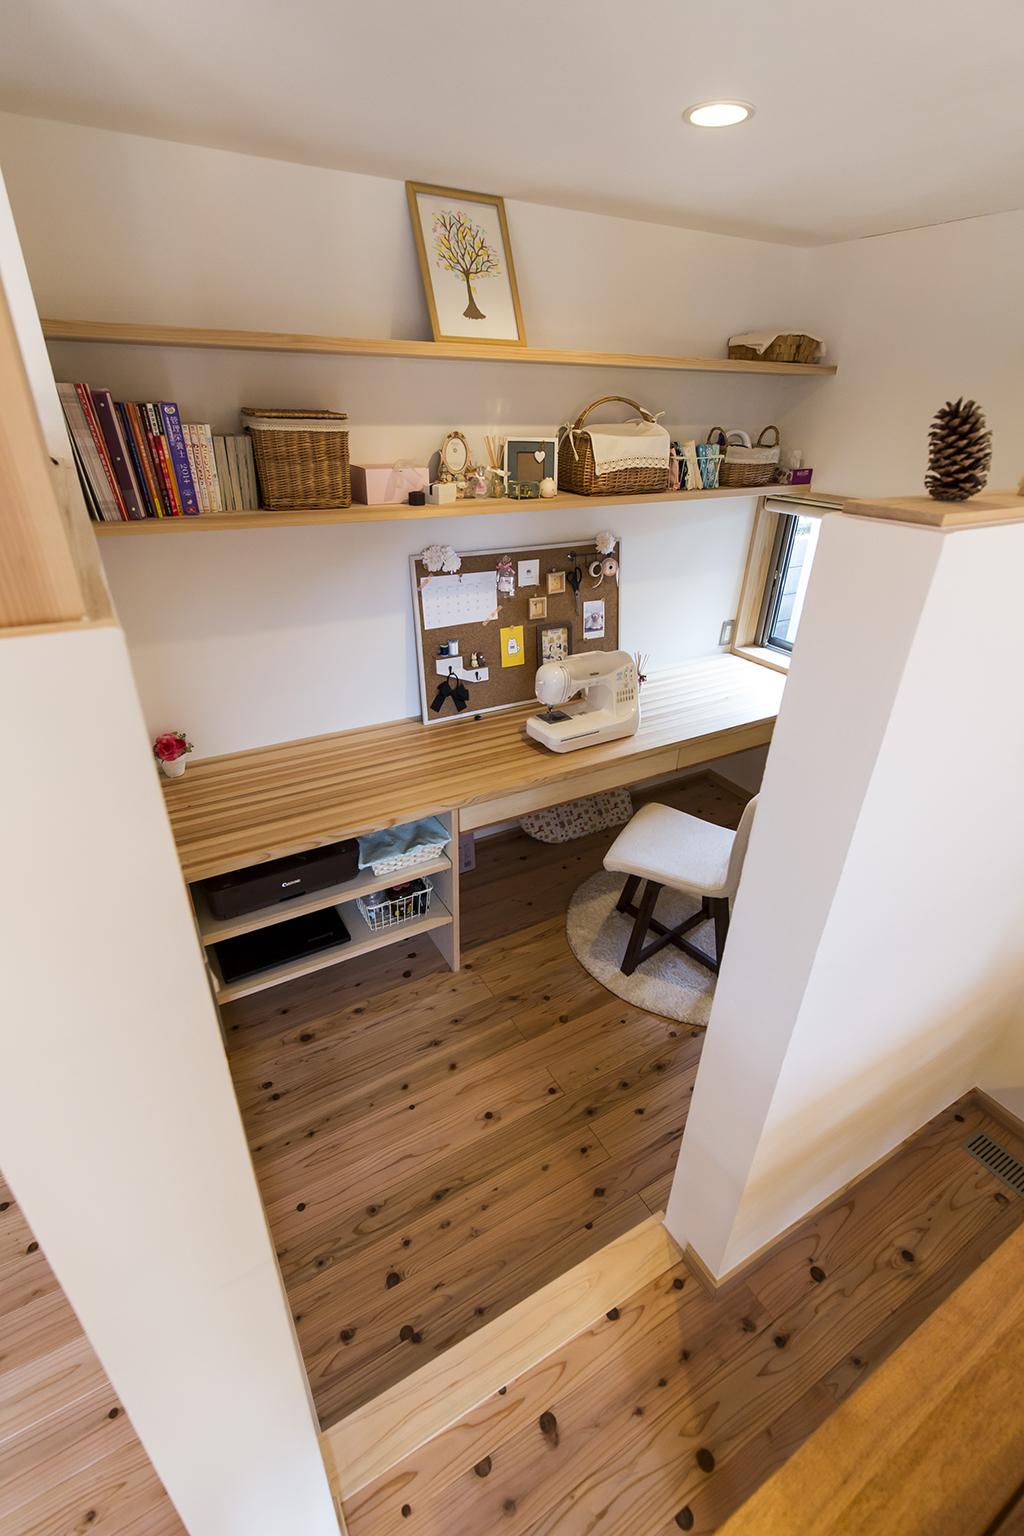 姫路市の木の家 奥さまの趣味室